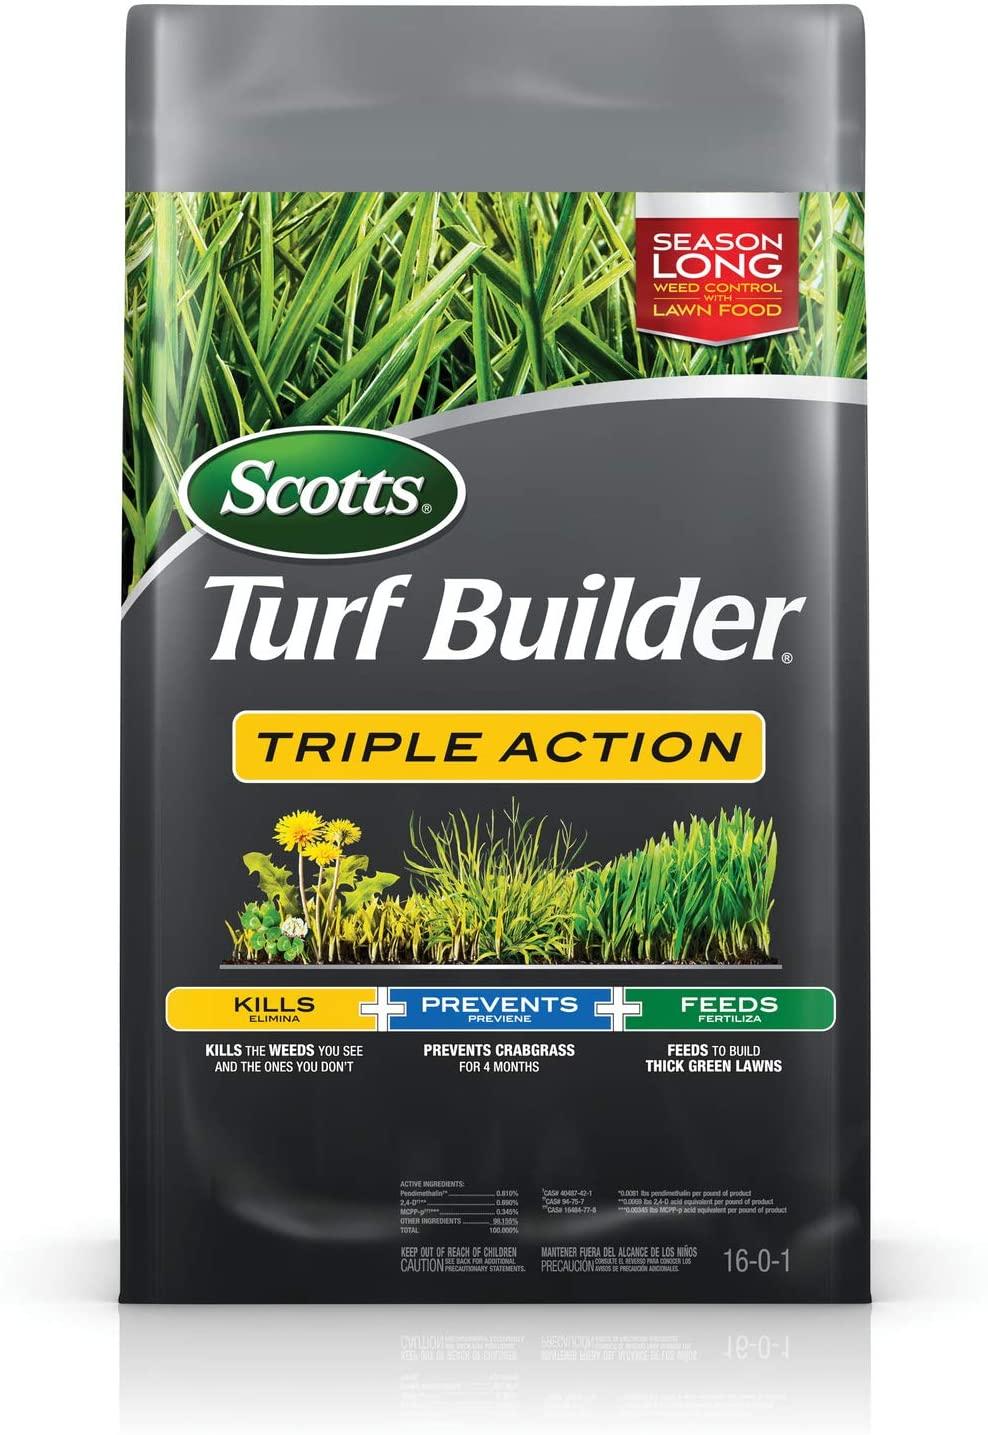 Scott's Triple Action Turf Builder